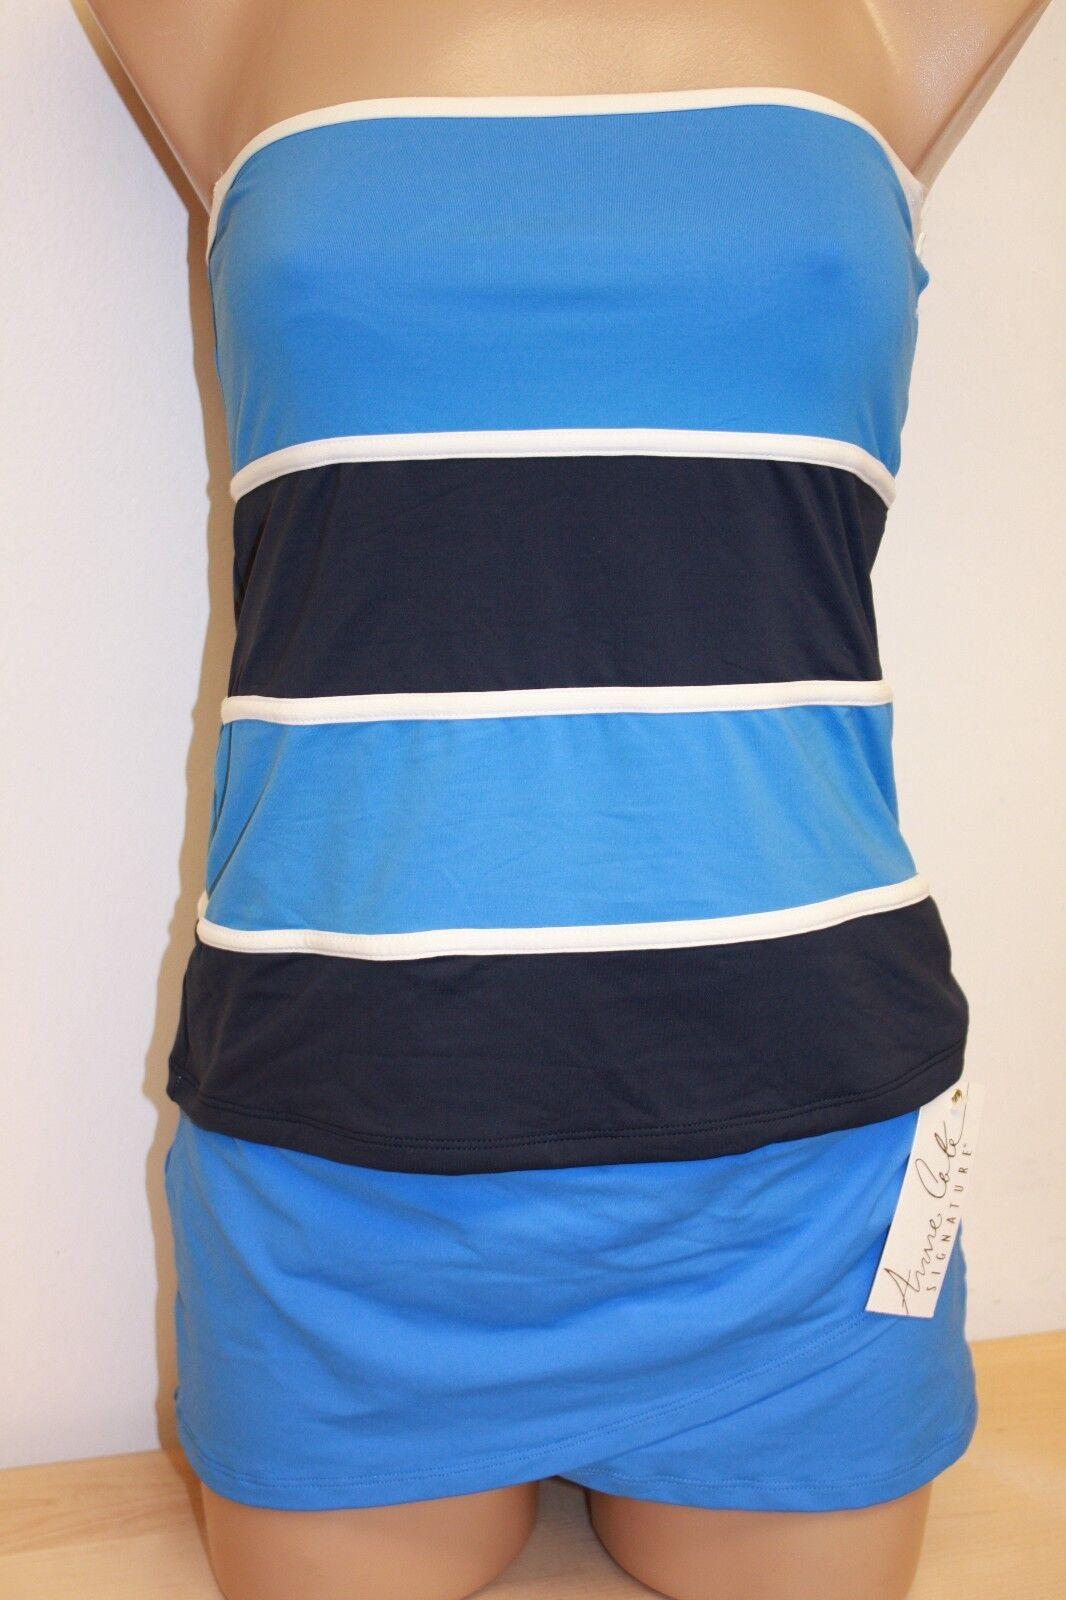 NWT Anne Cole Swimsuit Bikini Tankini 2 pc set Sz S Skirt Strapless Indi